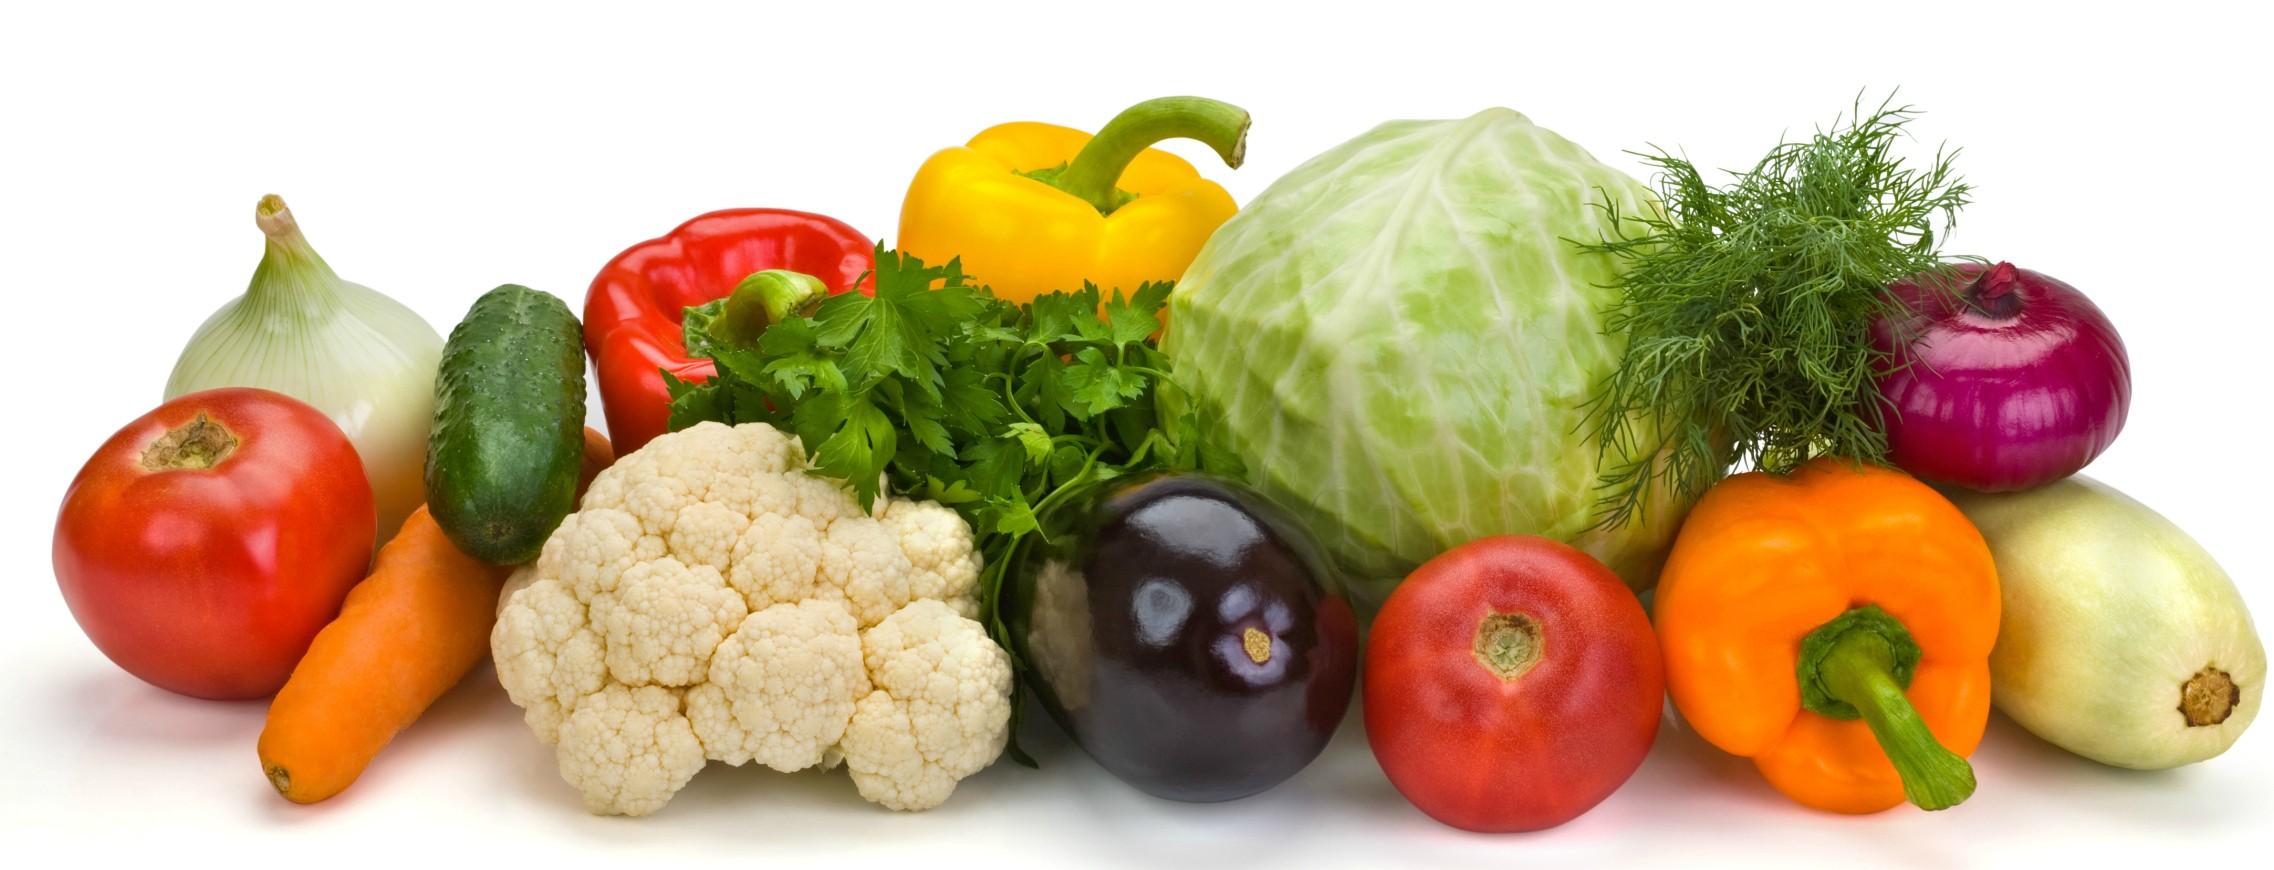 Vegetables HD wallpapers, Desktop wallpaper - most viewed